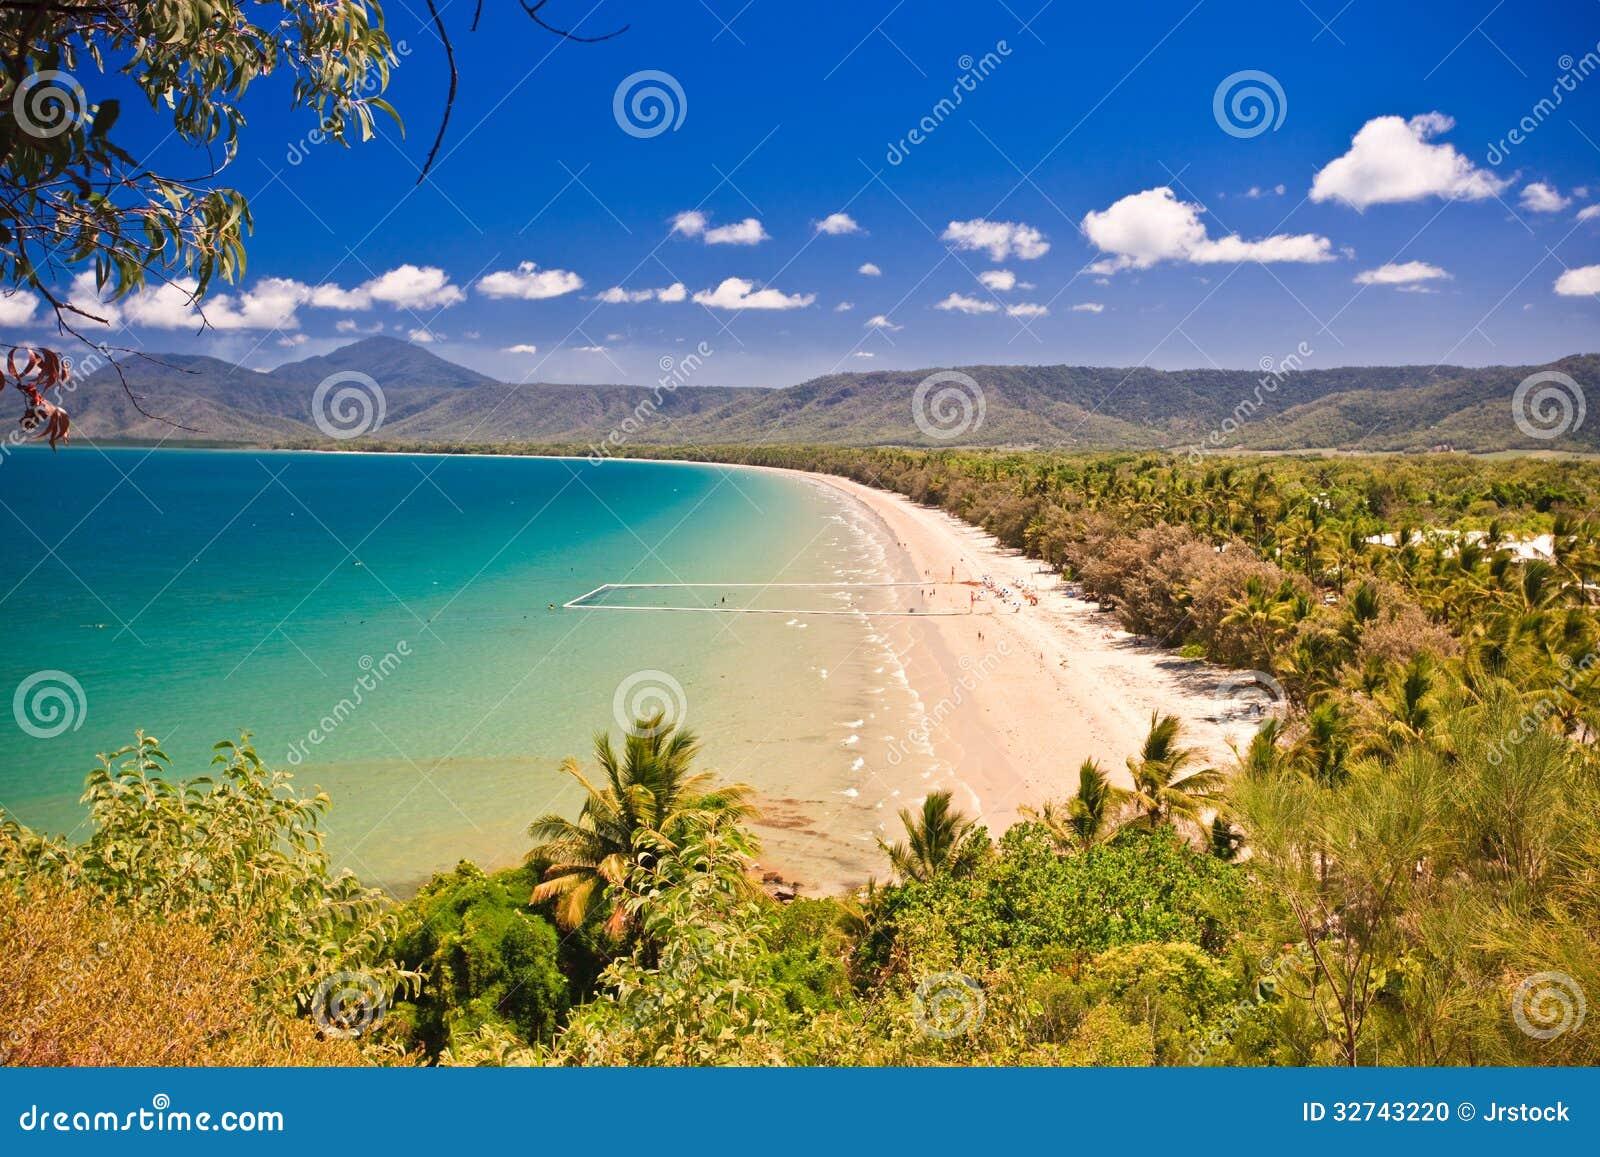 View of a beautiful tropical beach